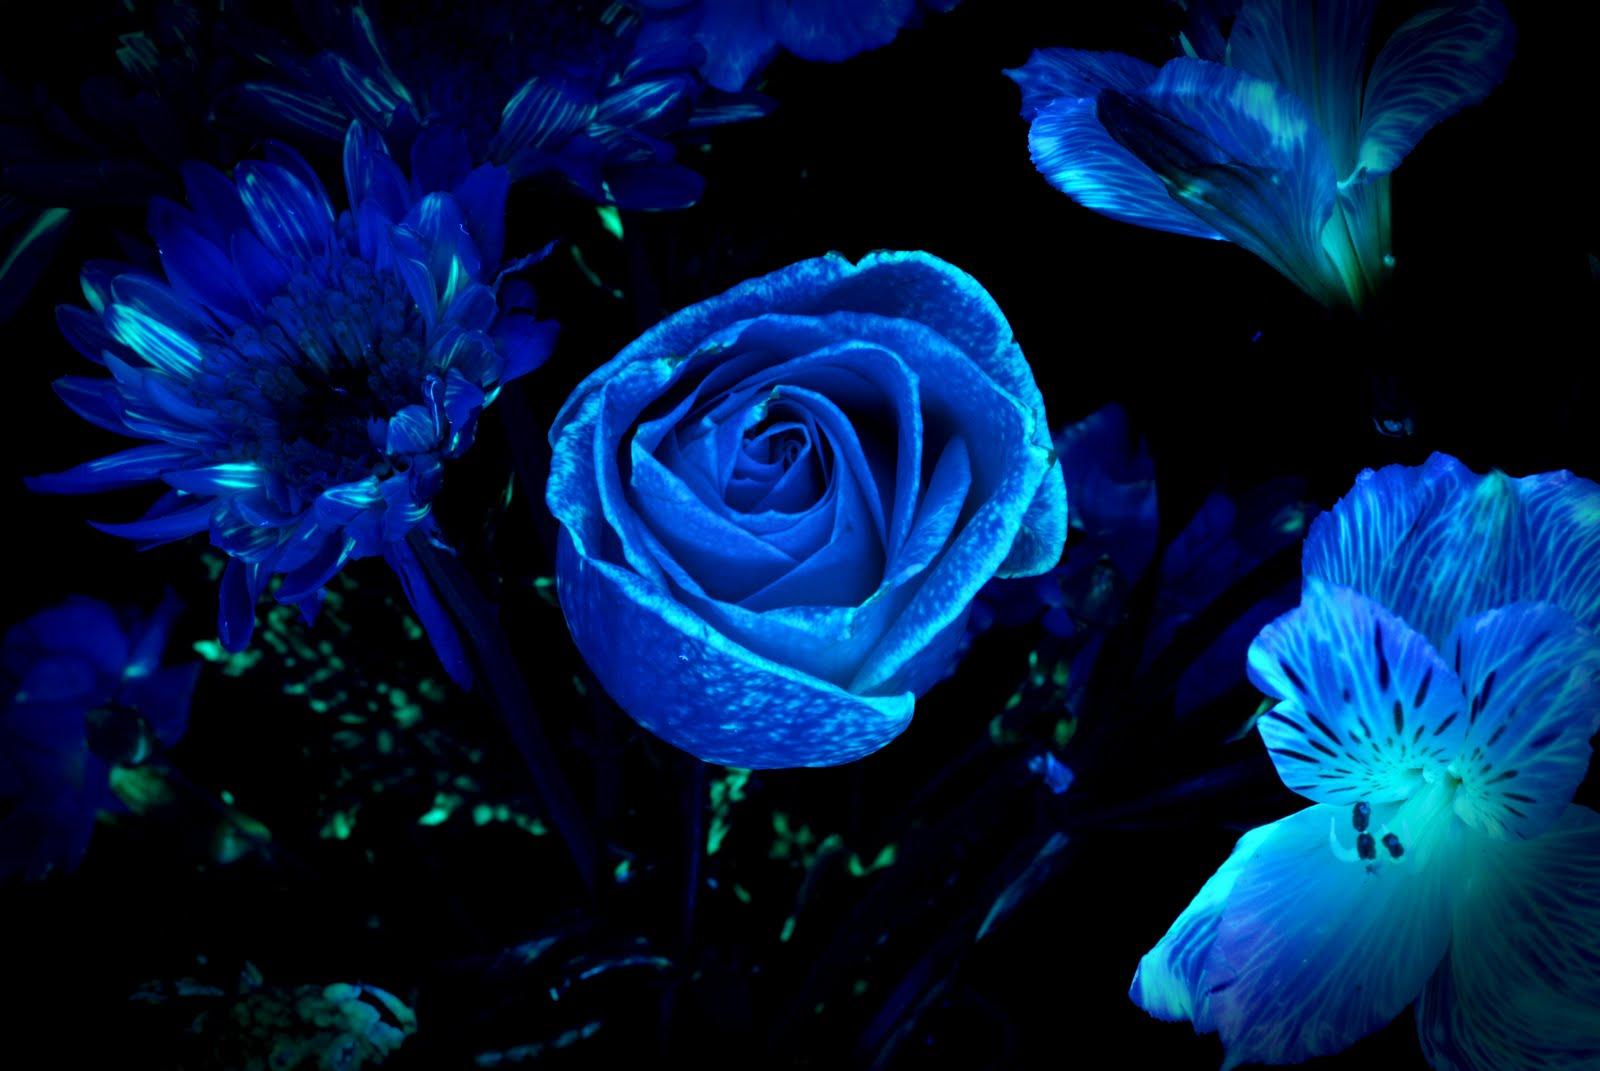 Glowing Flower Wallpapers - WallpaperSafari